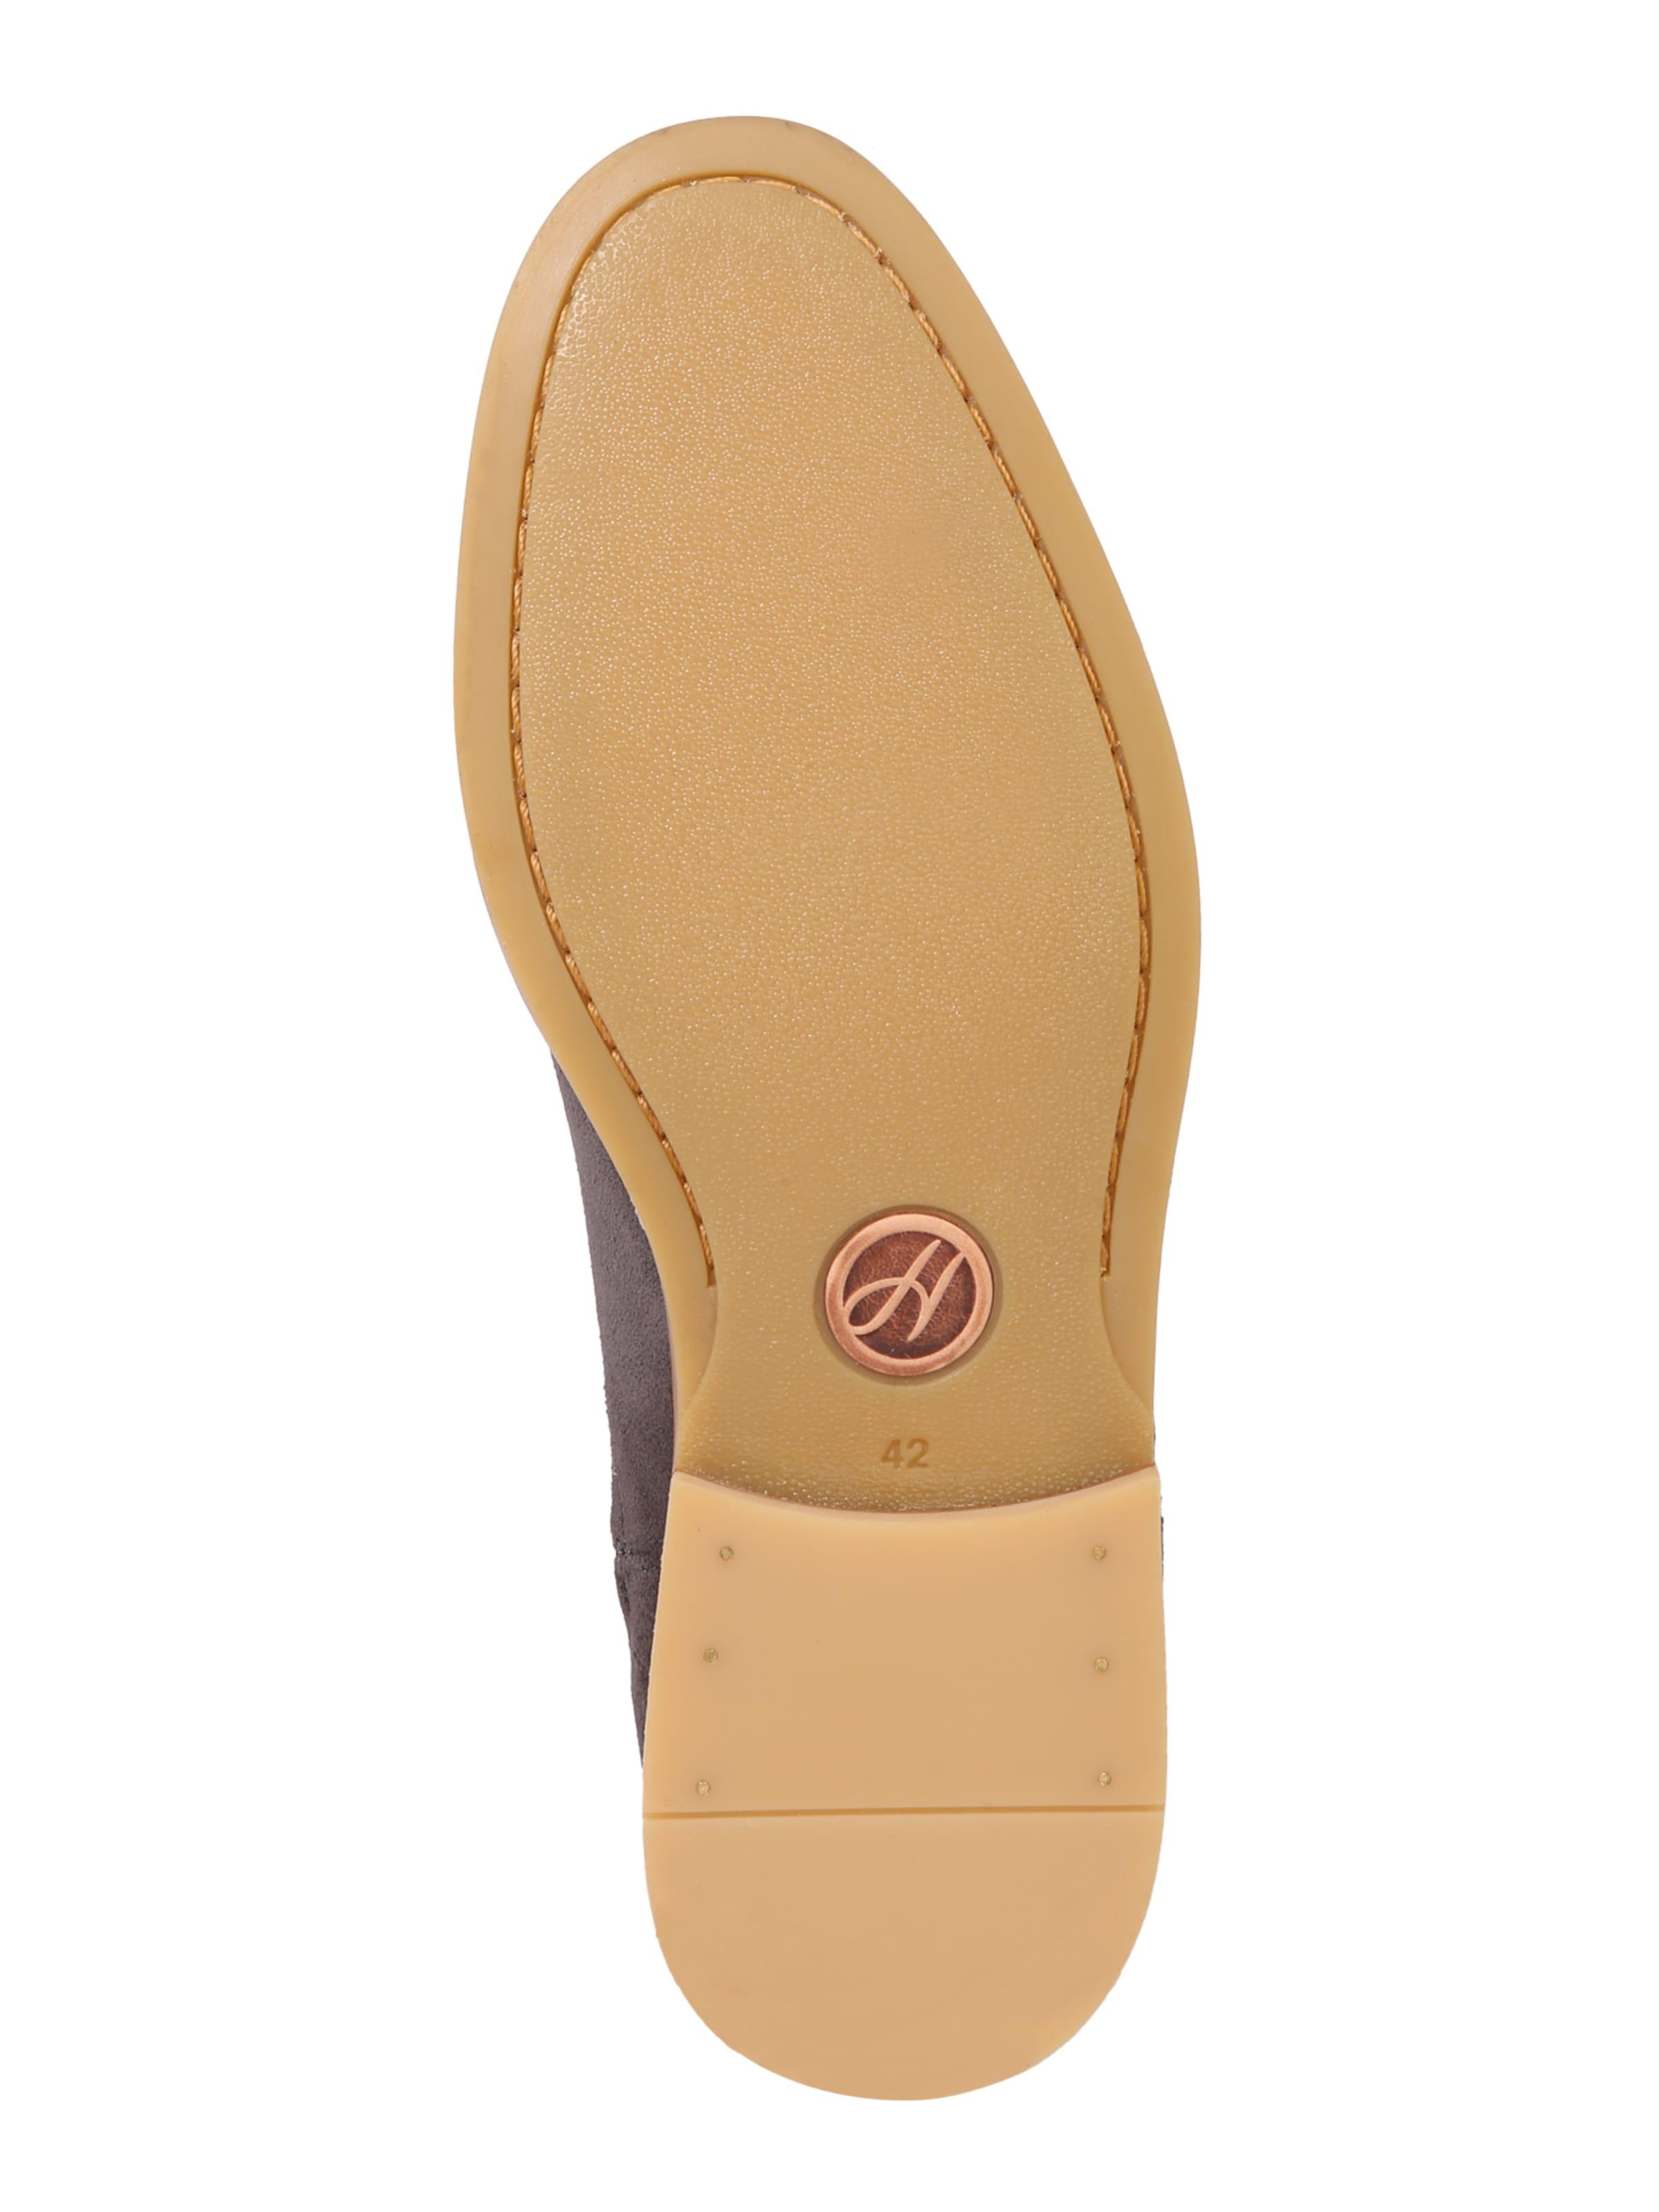 In Grau Boots Suede' 'adlington Hudson London xoeBdCr